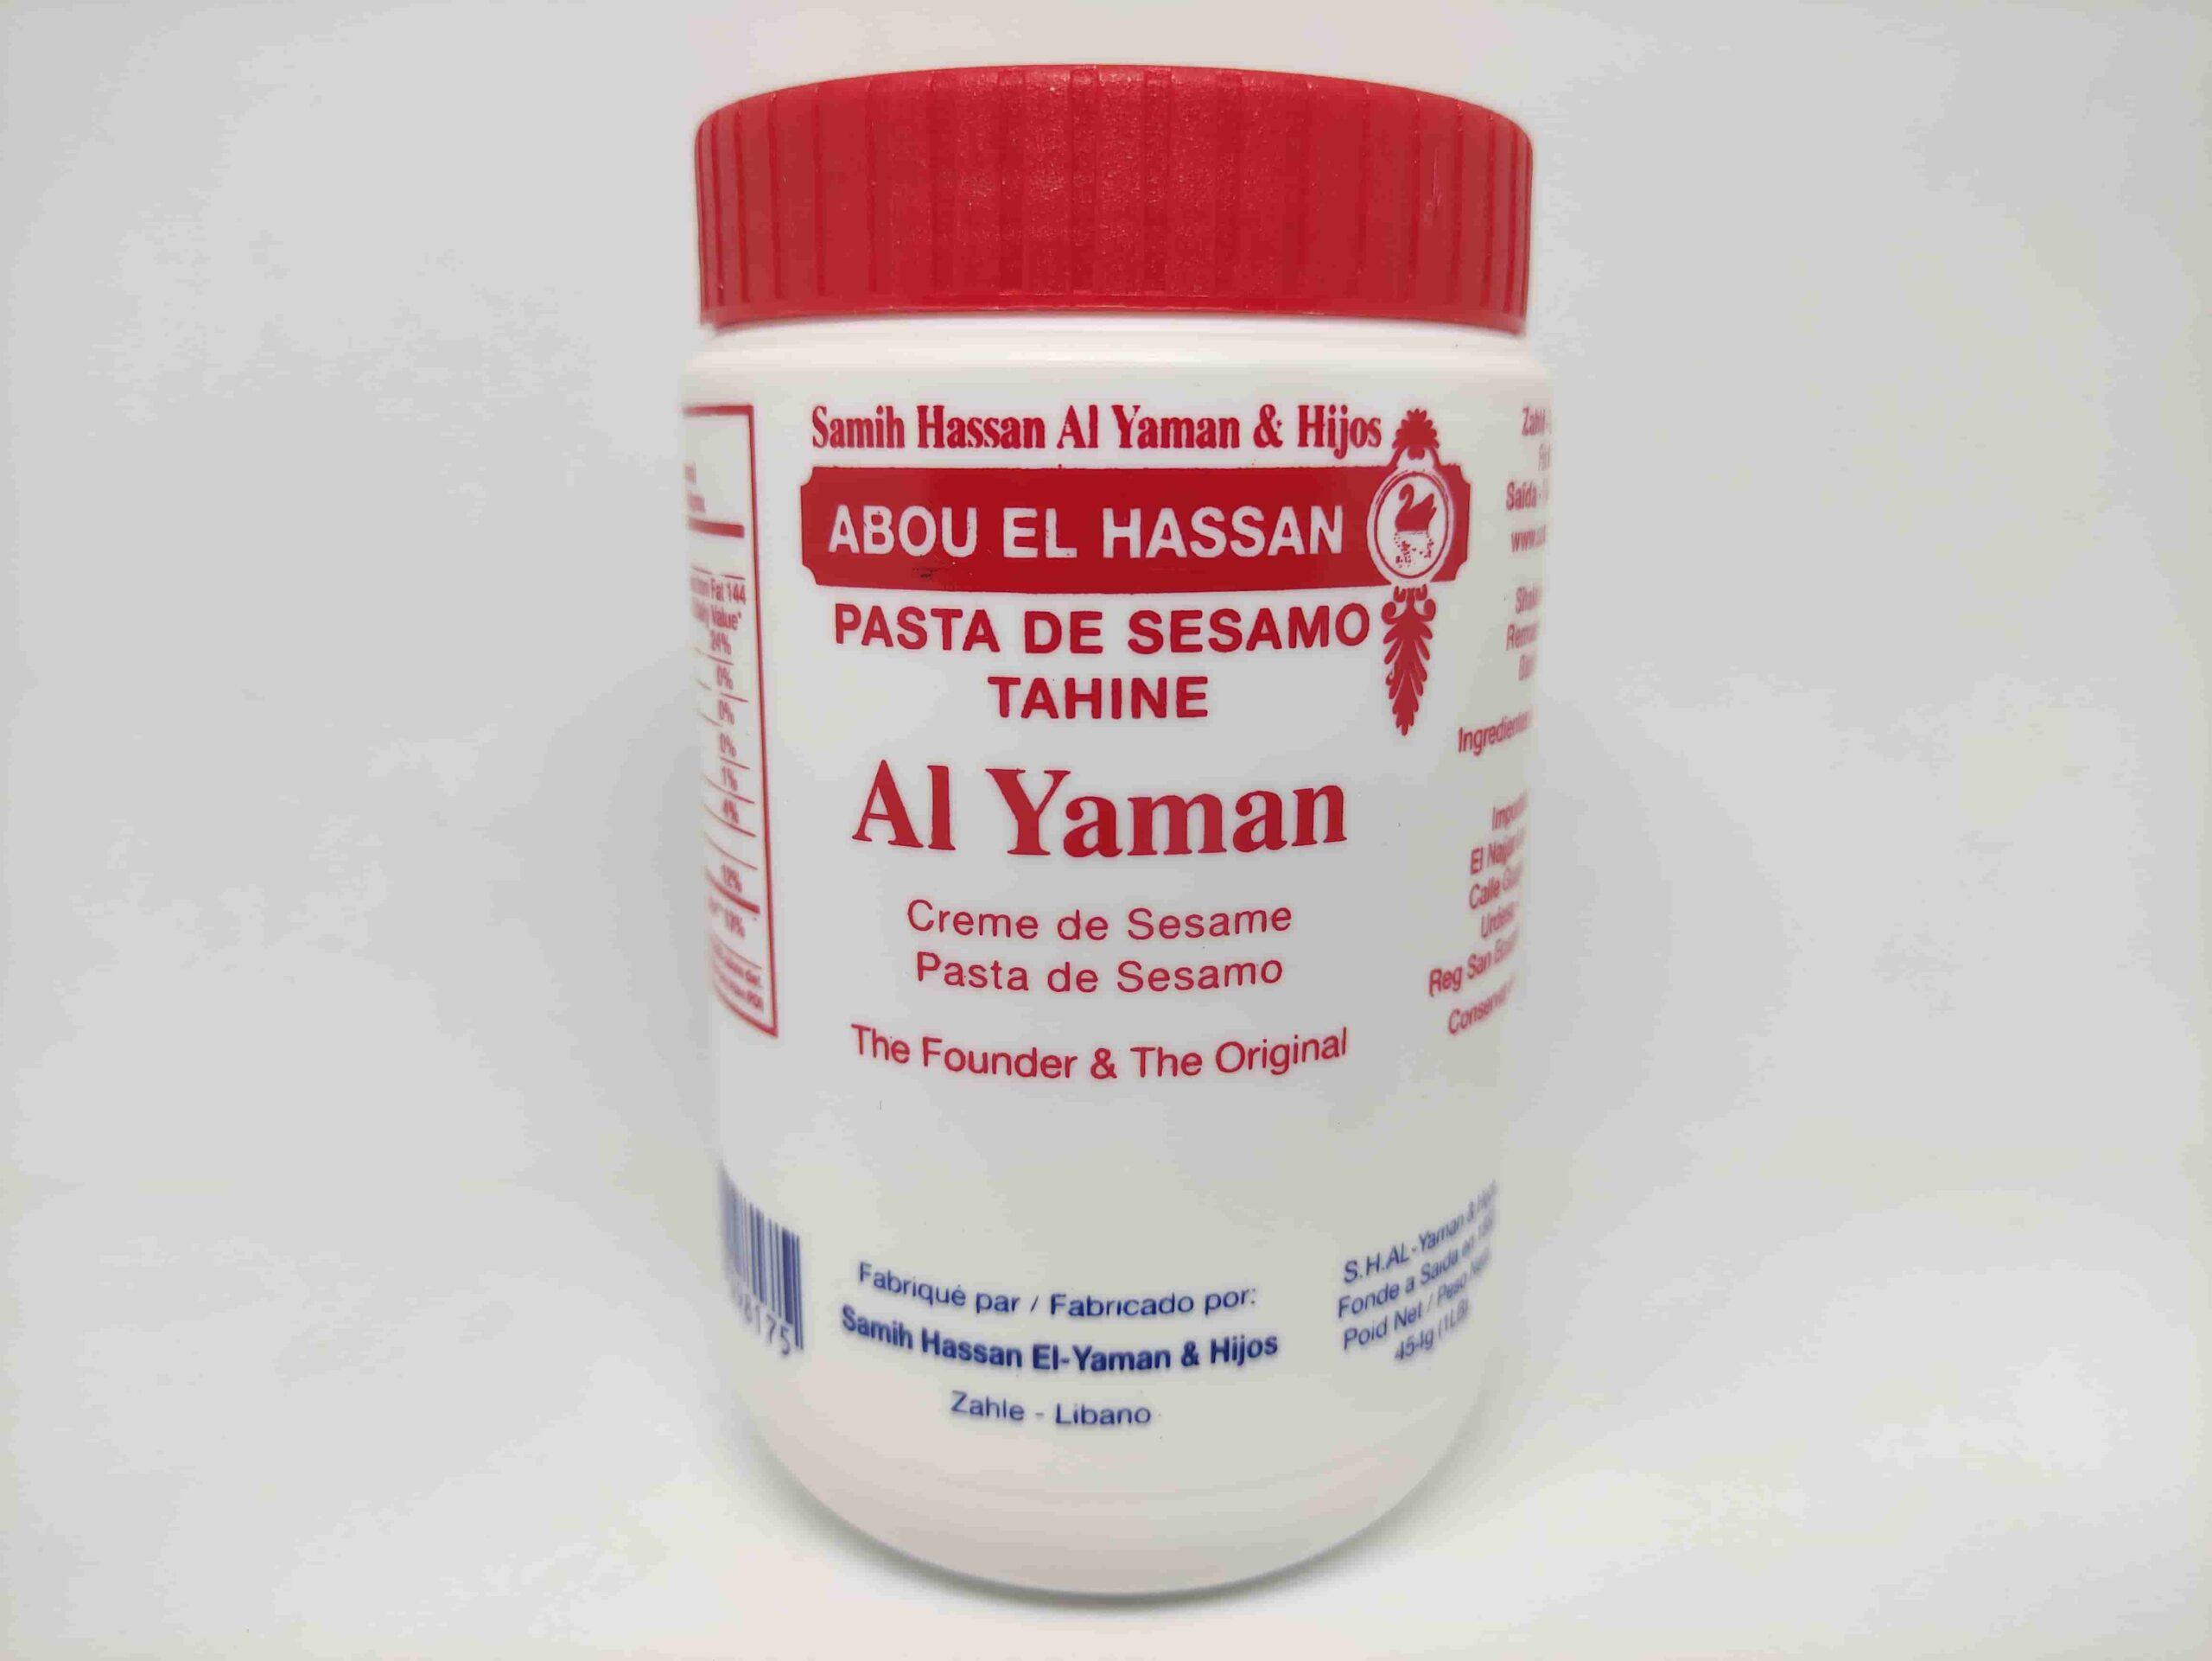 Samih Hassan Al Yaman & Sons Tahini